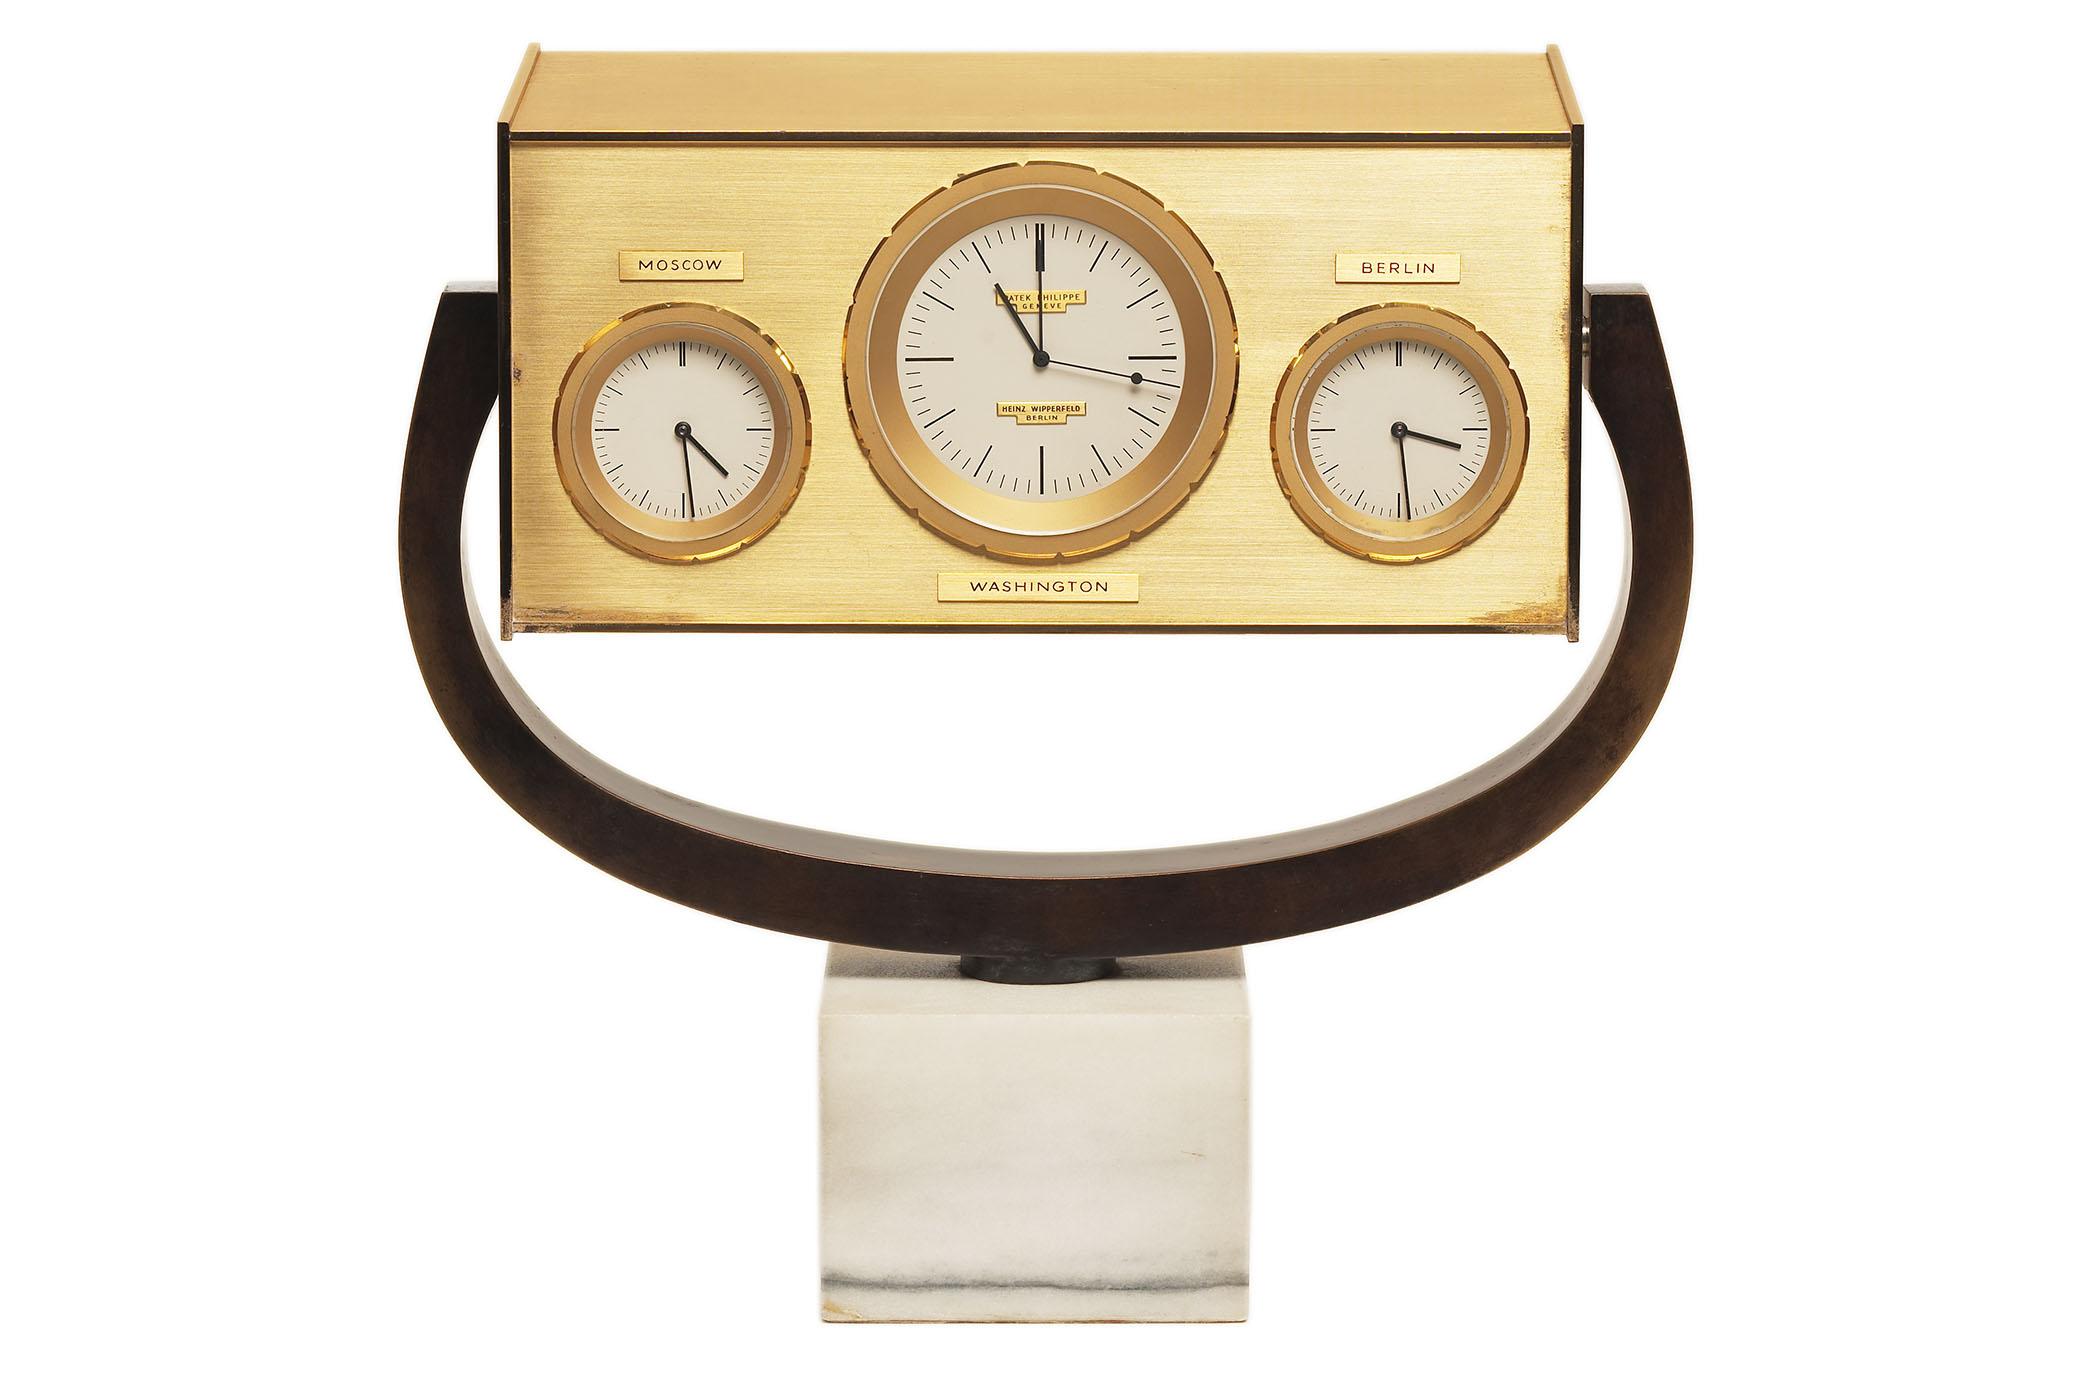 JFK Patek Philippe Desk clock